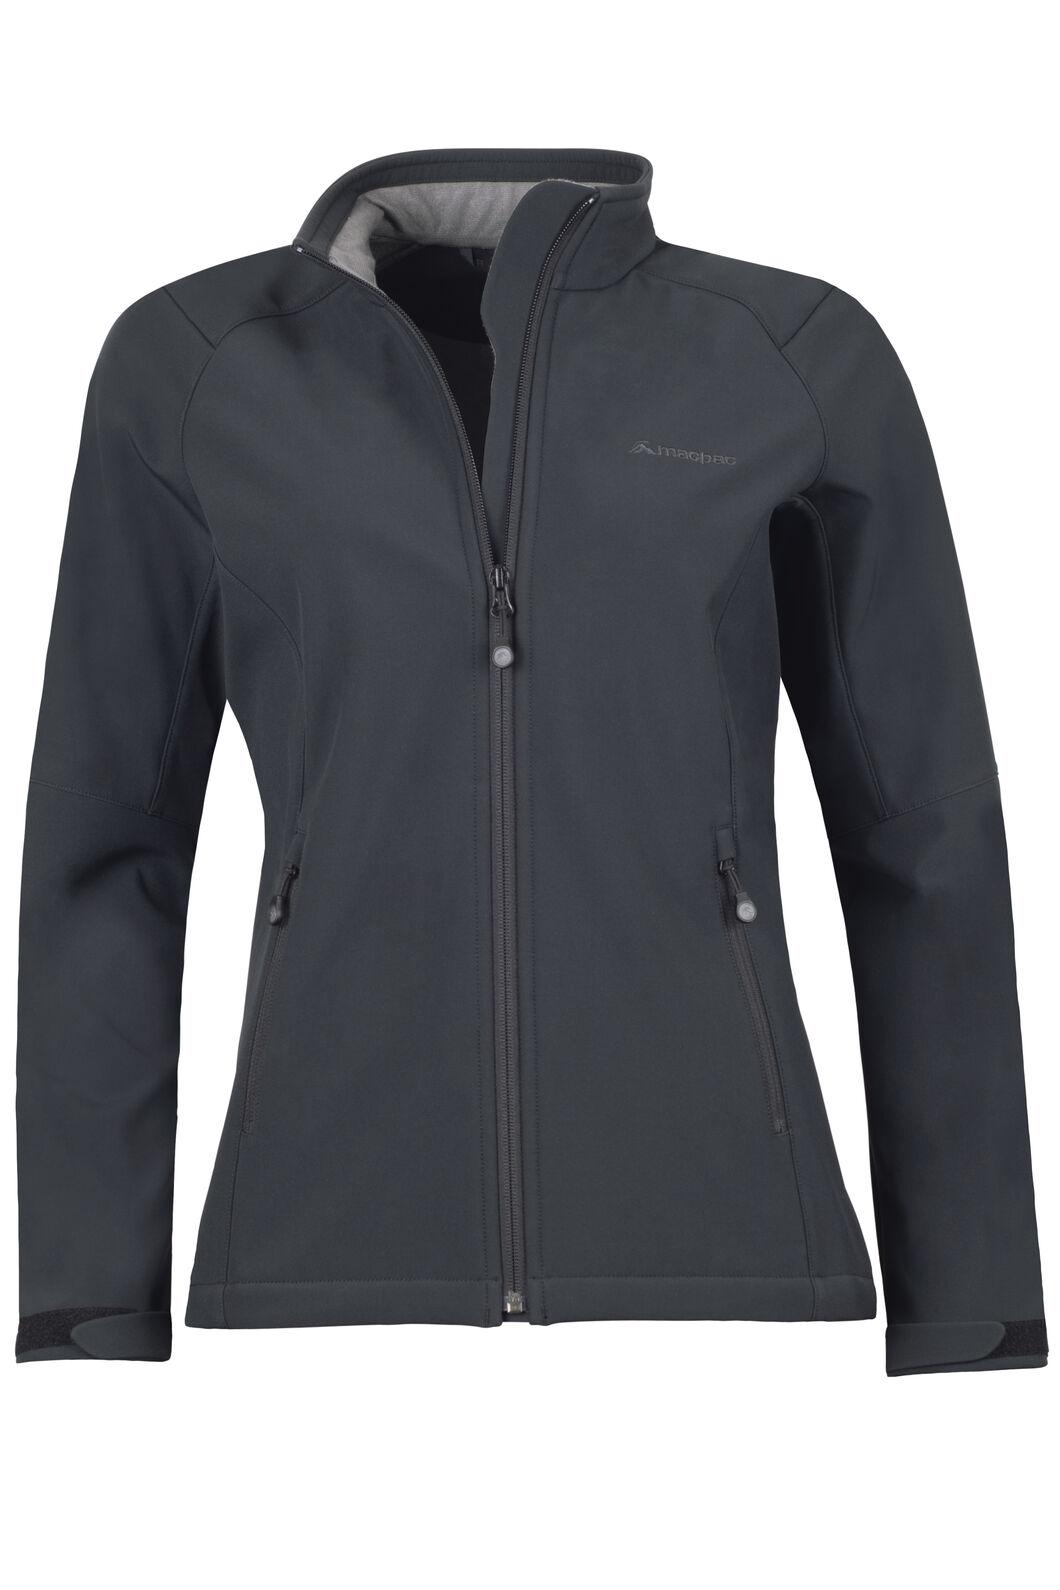 Sabre Softshell Jacket - Women's, Black, hi-res